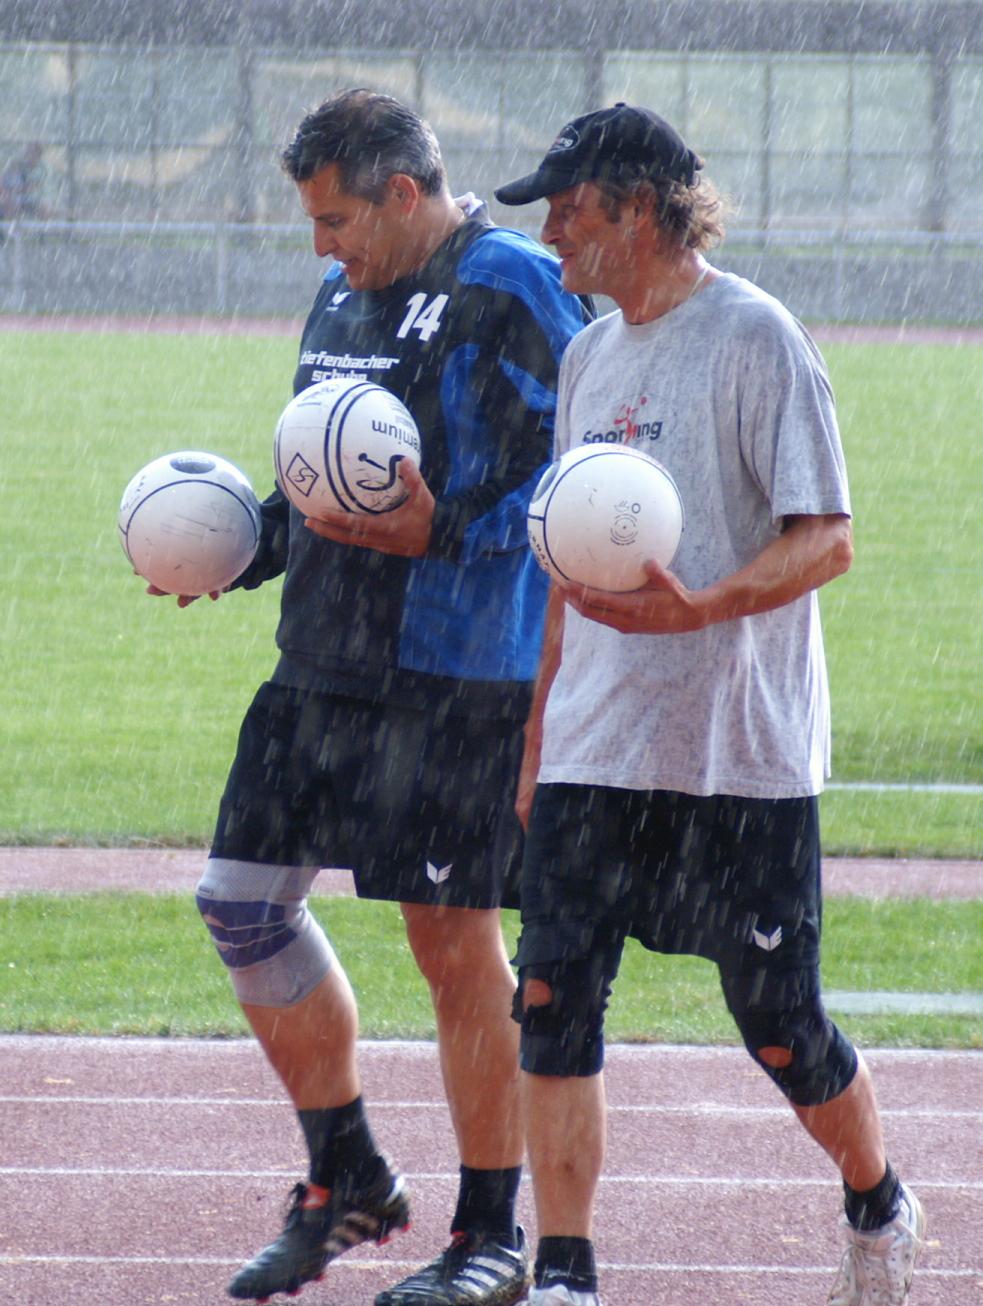 07/07/11: Meisterschaft, FBD Dietikon 1